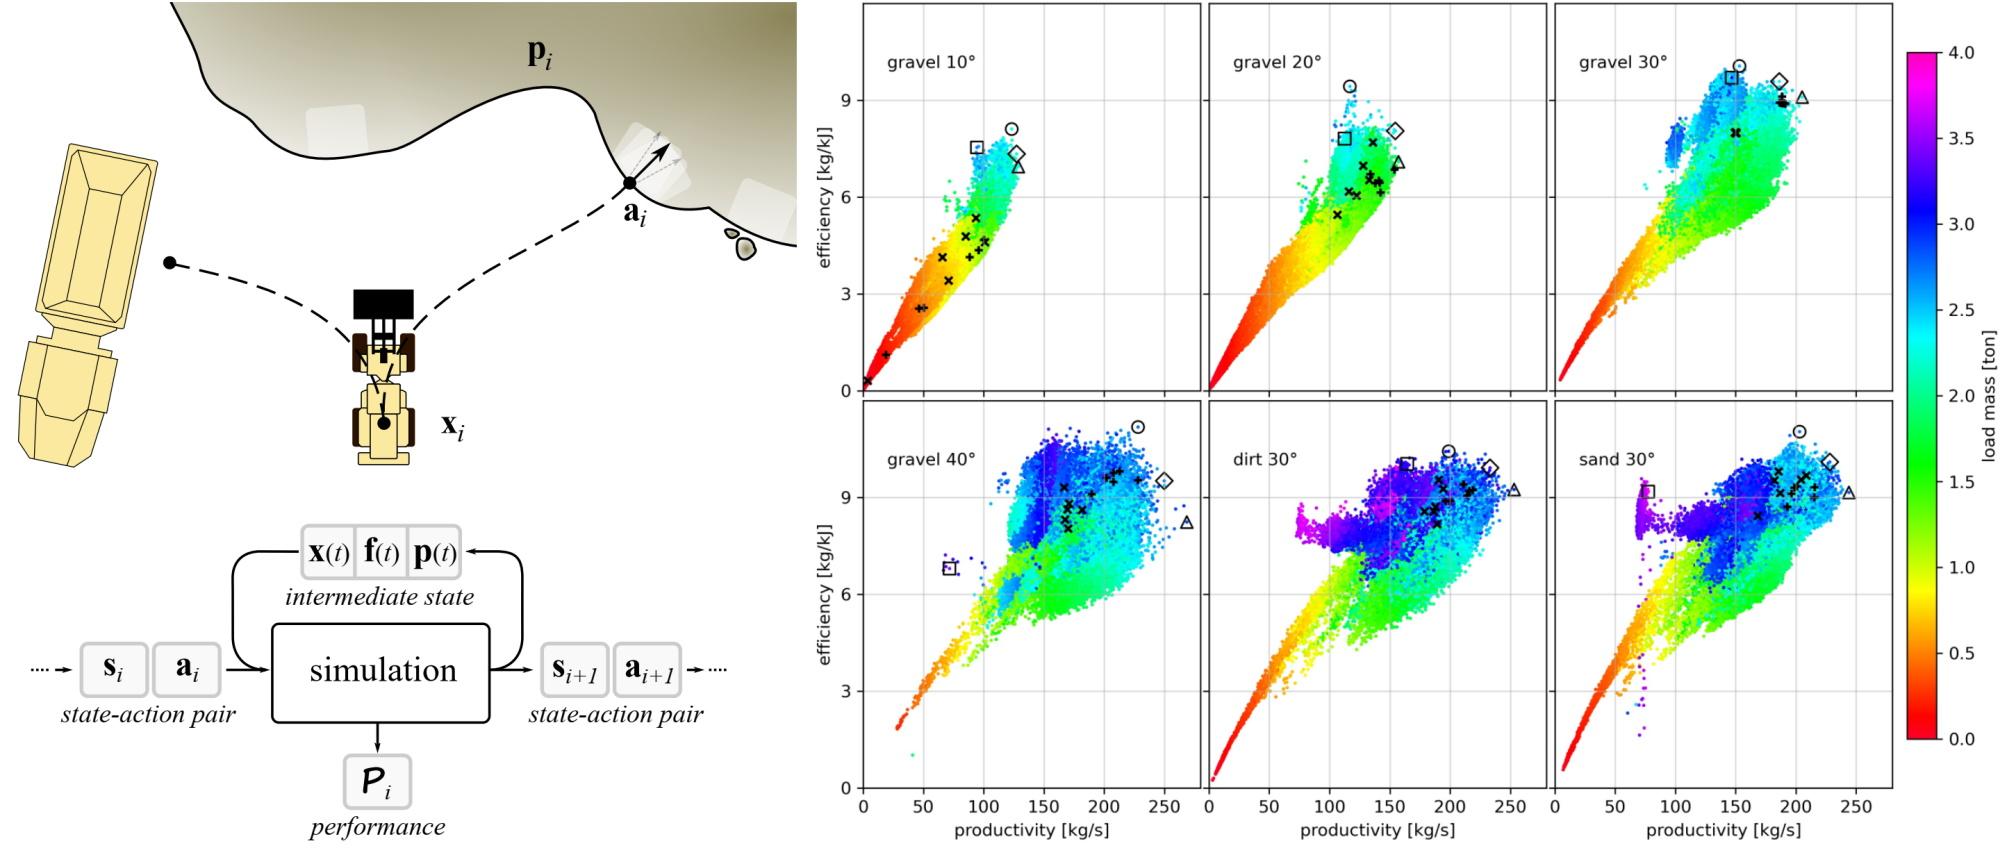 Simulation-Based Optimization of High-Performance Wheel Loading